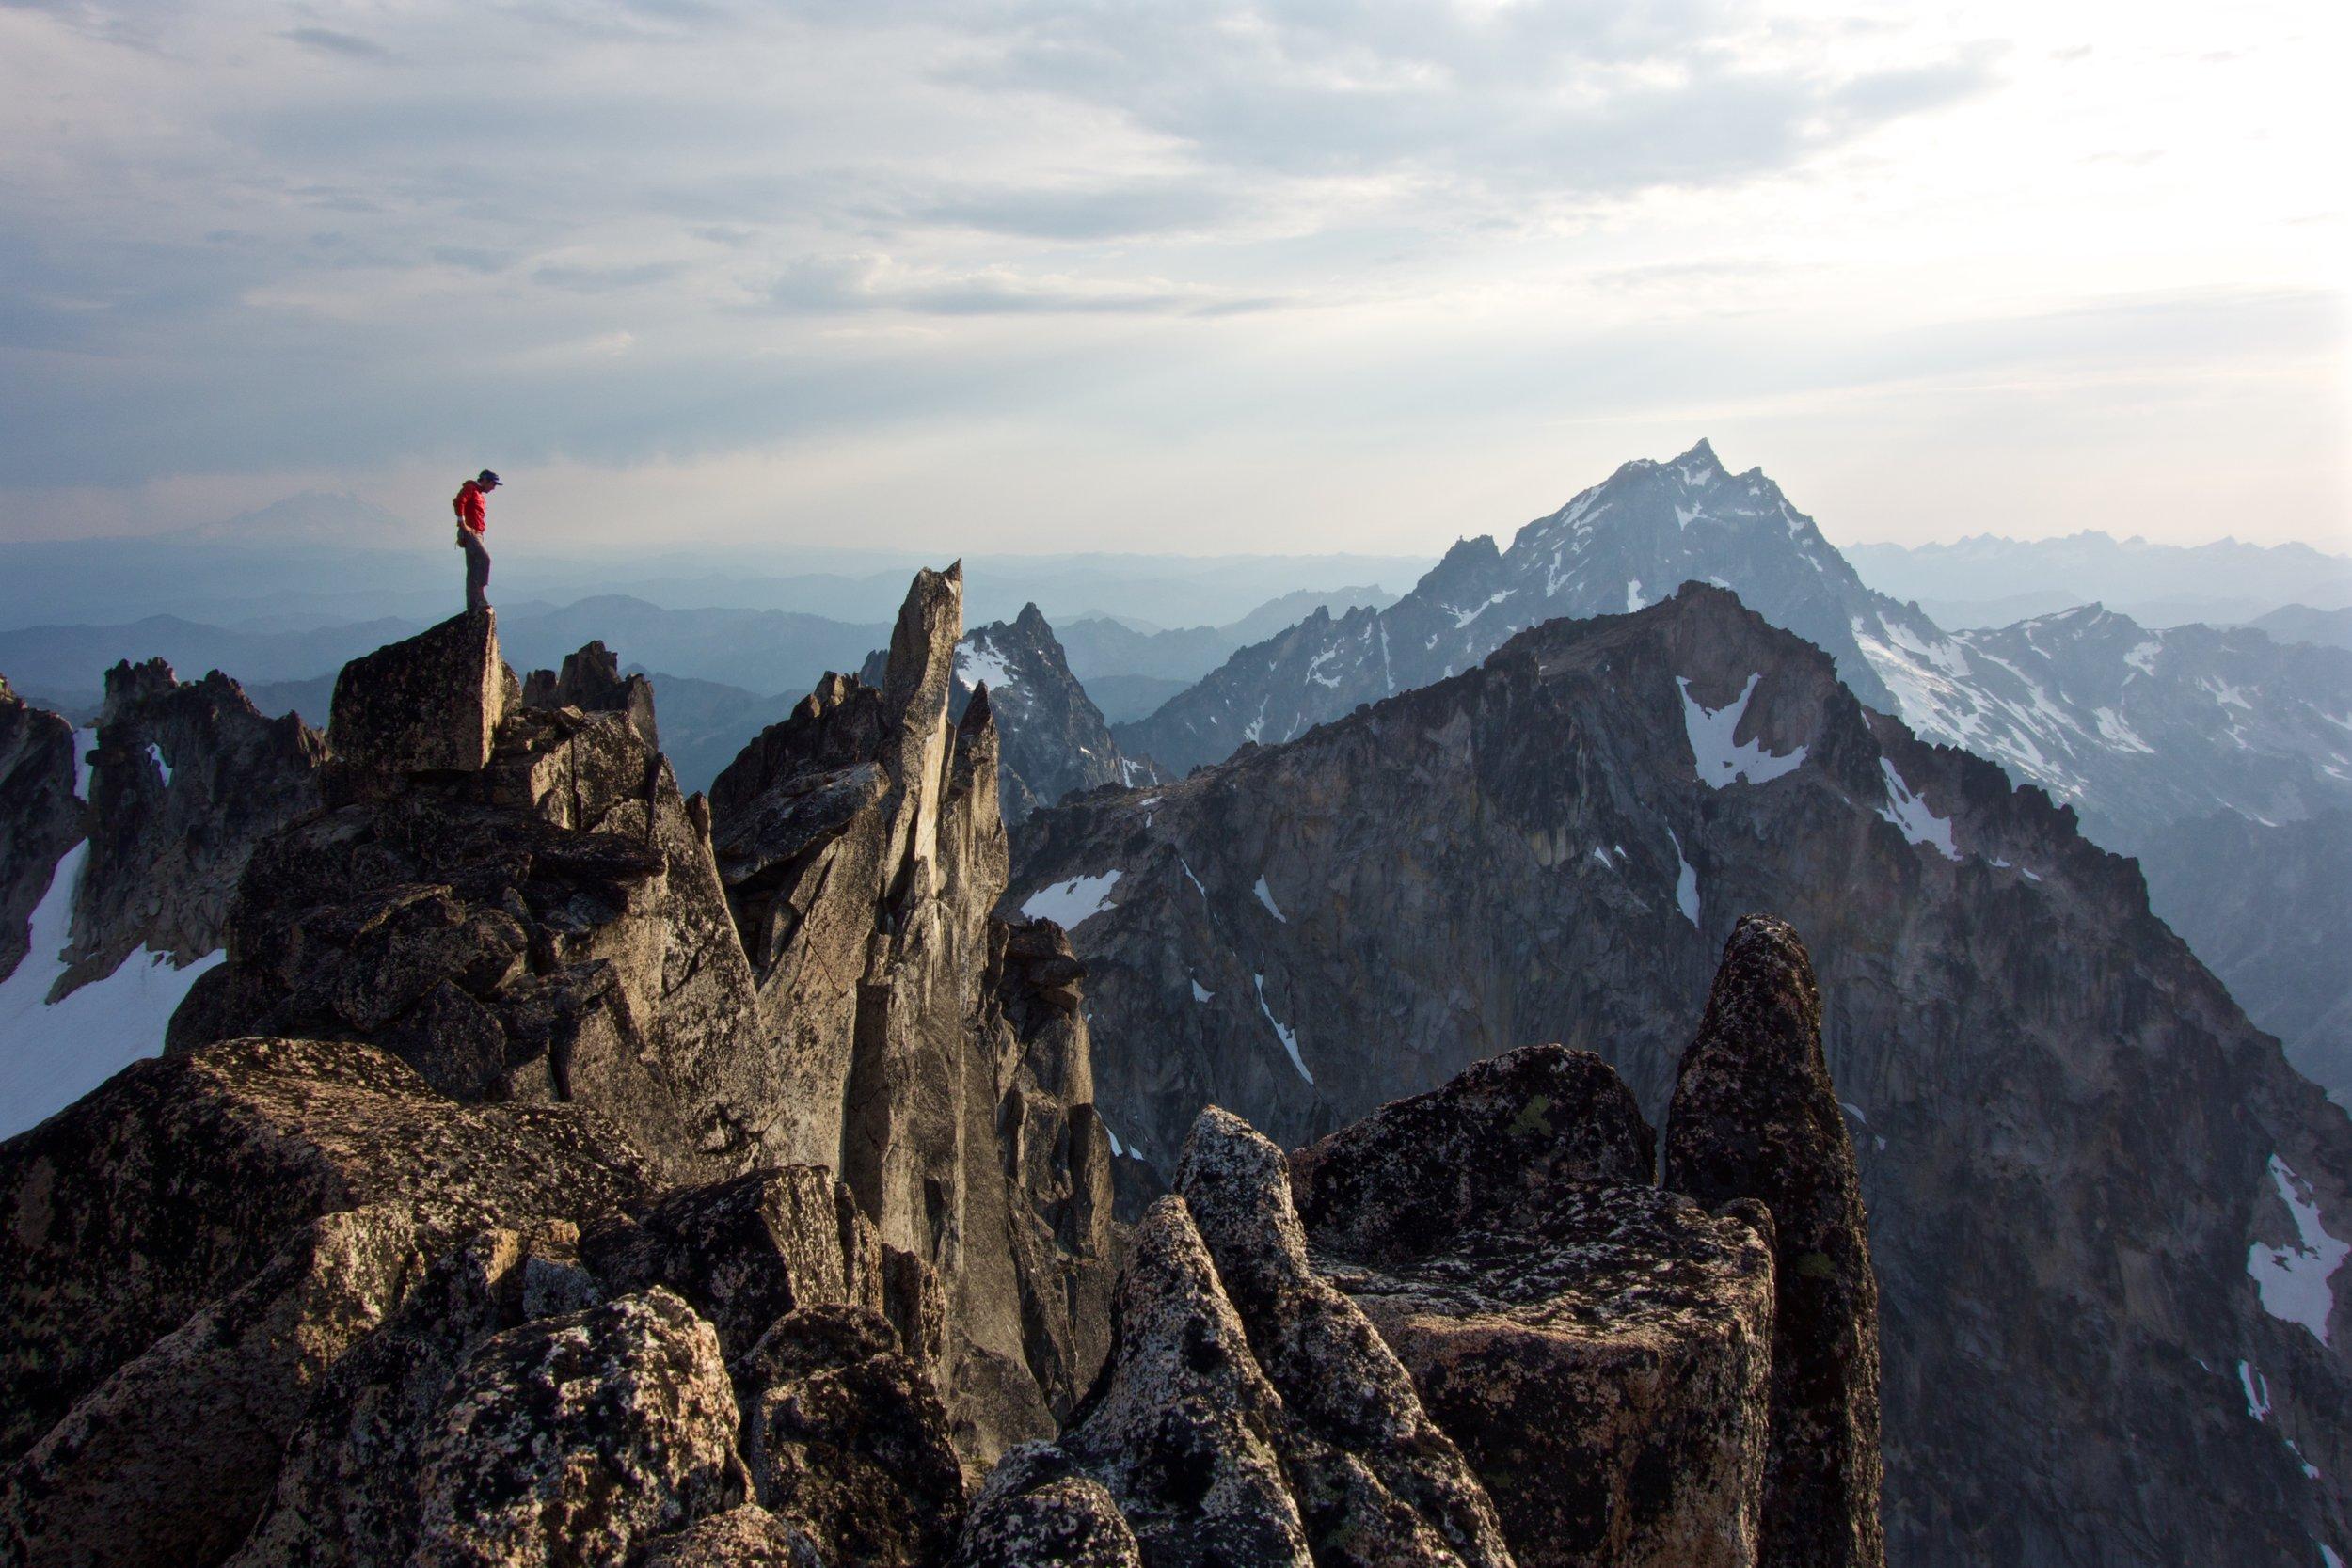 Enjoying the summit view